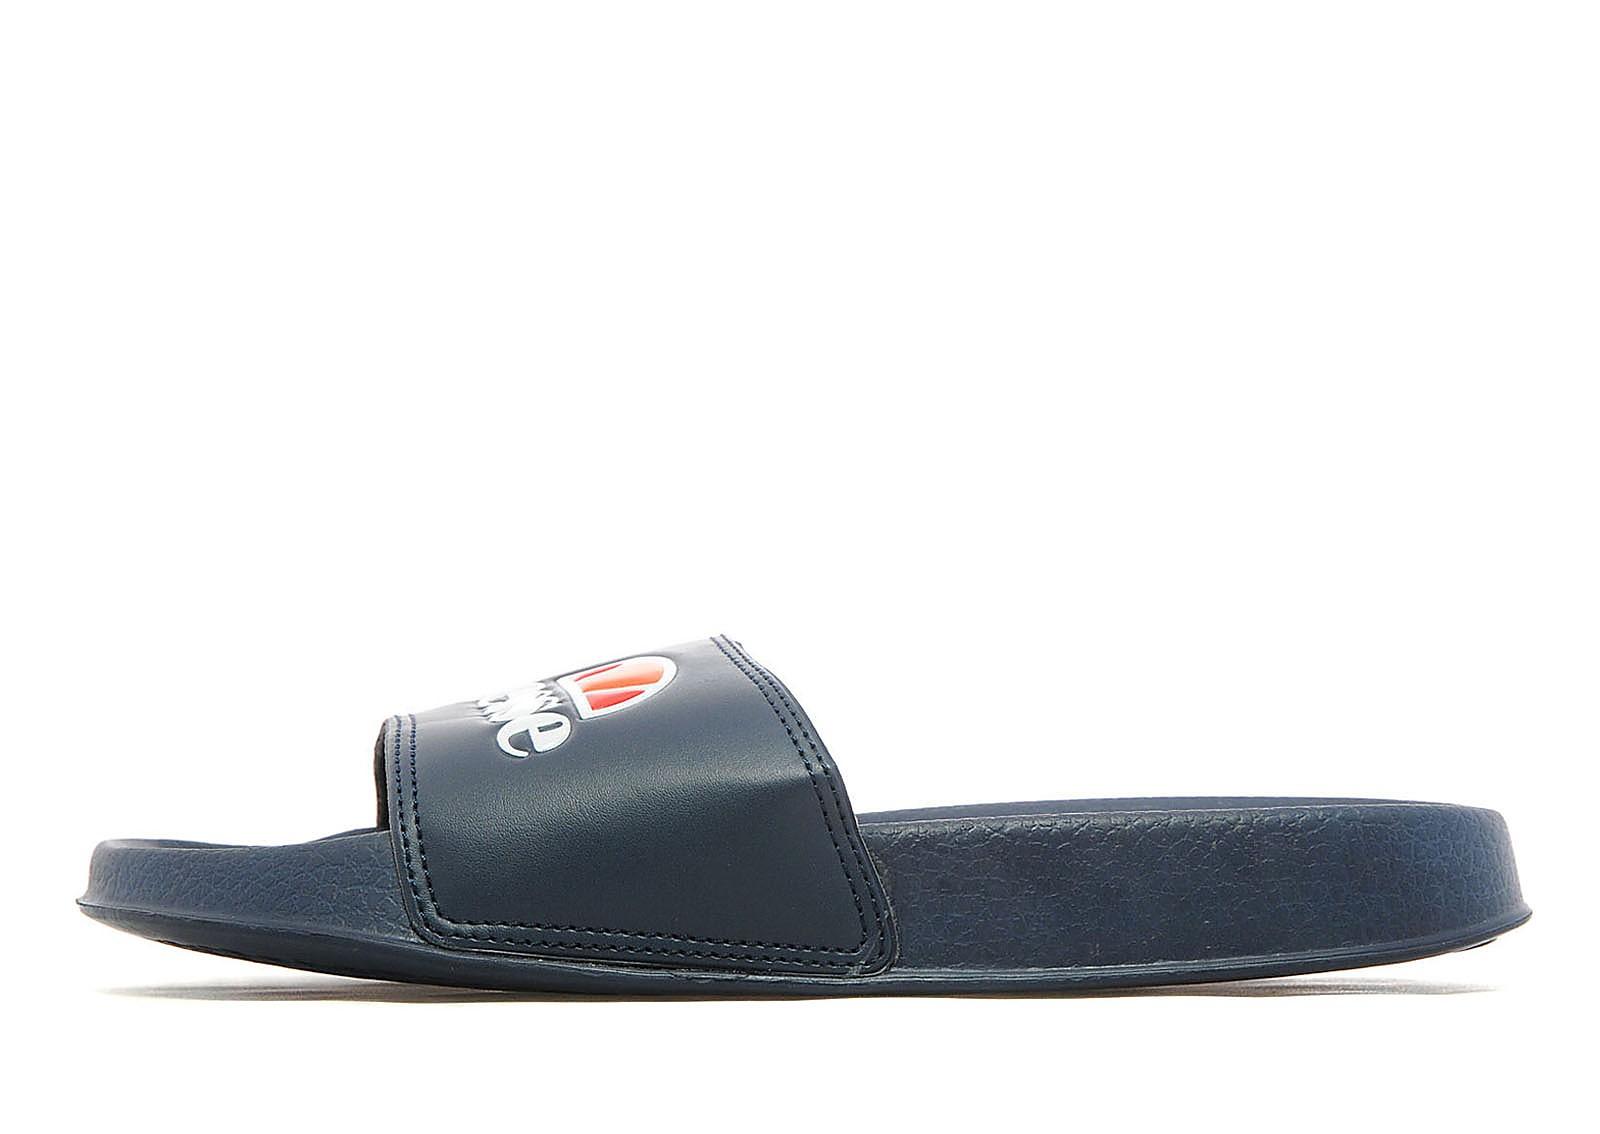 Ellesse Monaco Slide Sandals